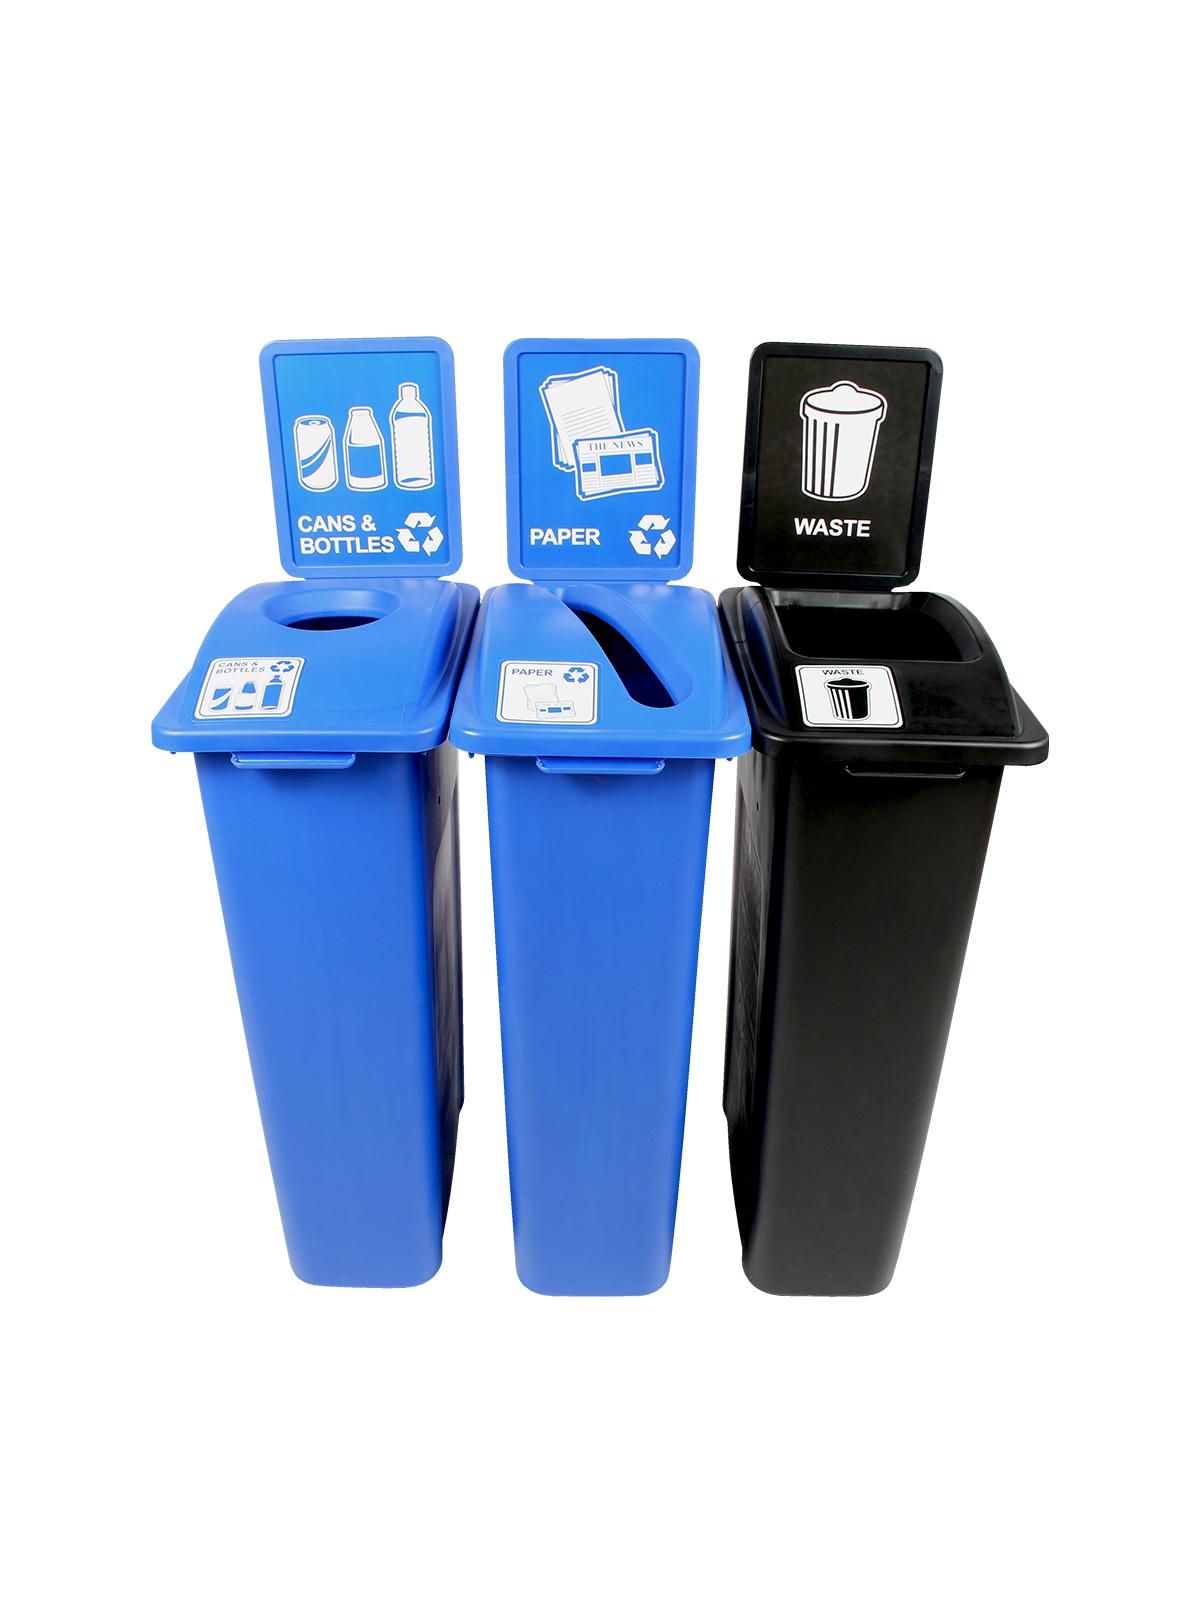 WASTE WATCHER - Triple - Cans & Bottles-Paper-Waste - Circle-Slot-Full - Blue-Blue-Black